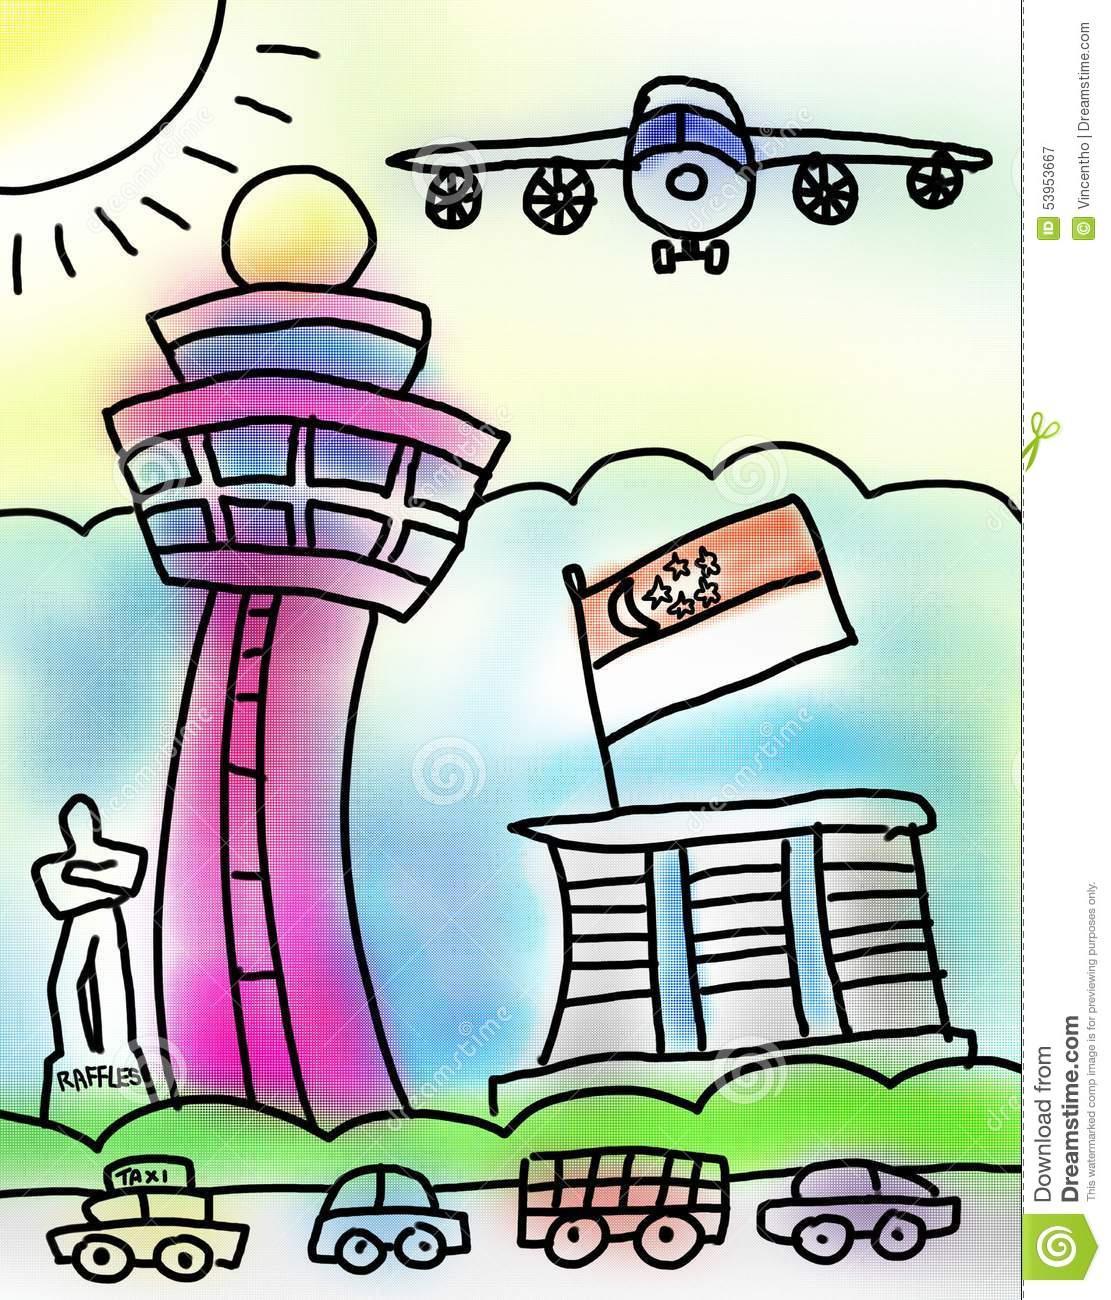 Singapore Airport Raffles Marina Bay Sand Drawing Stock.